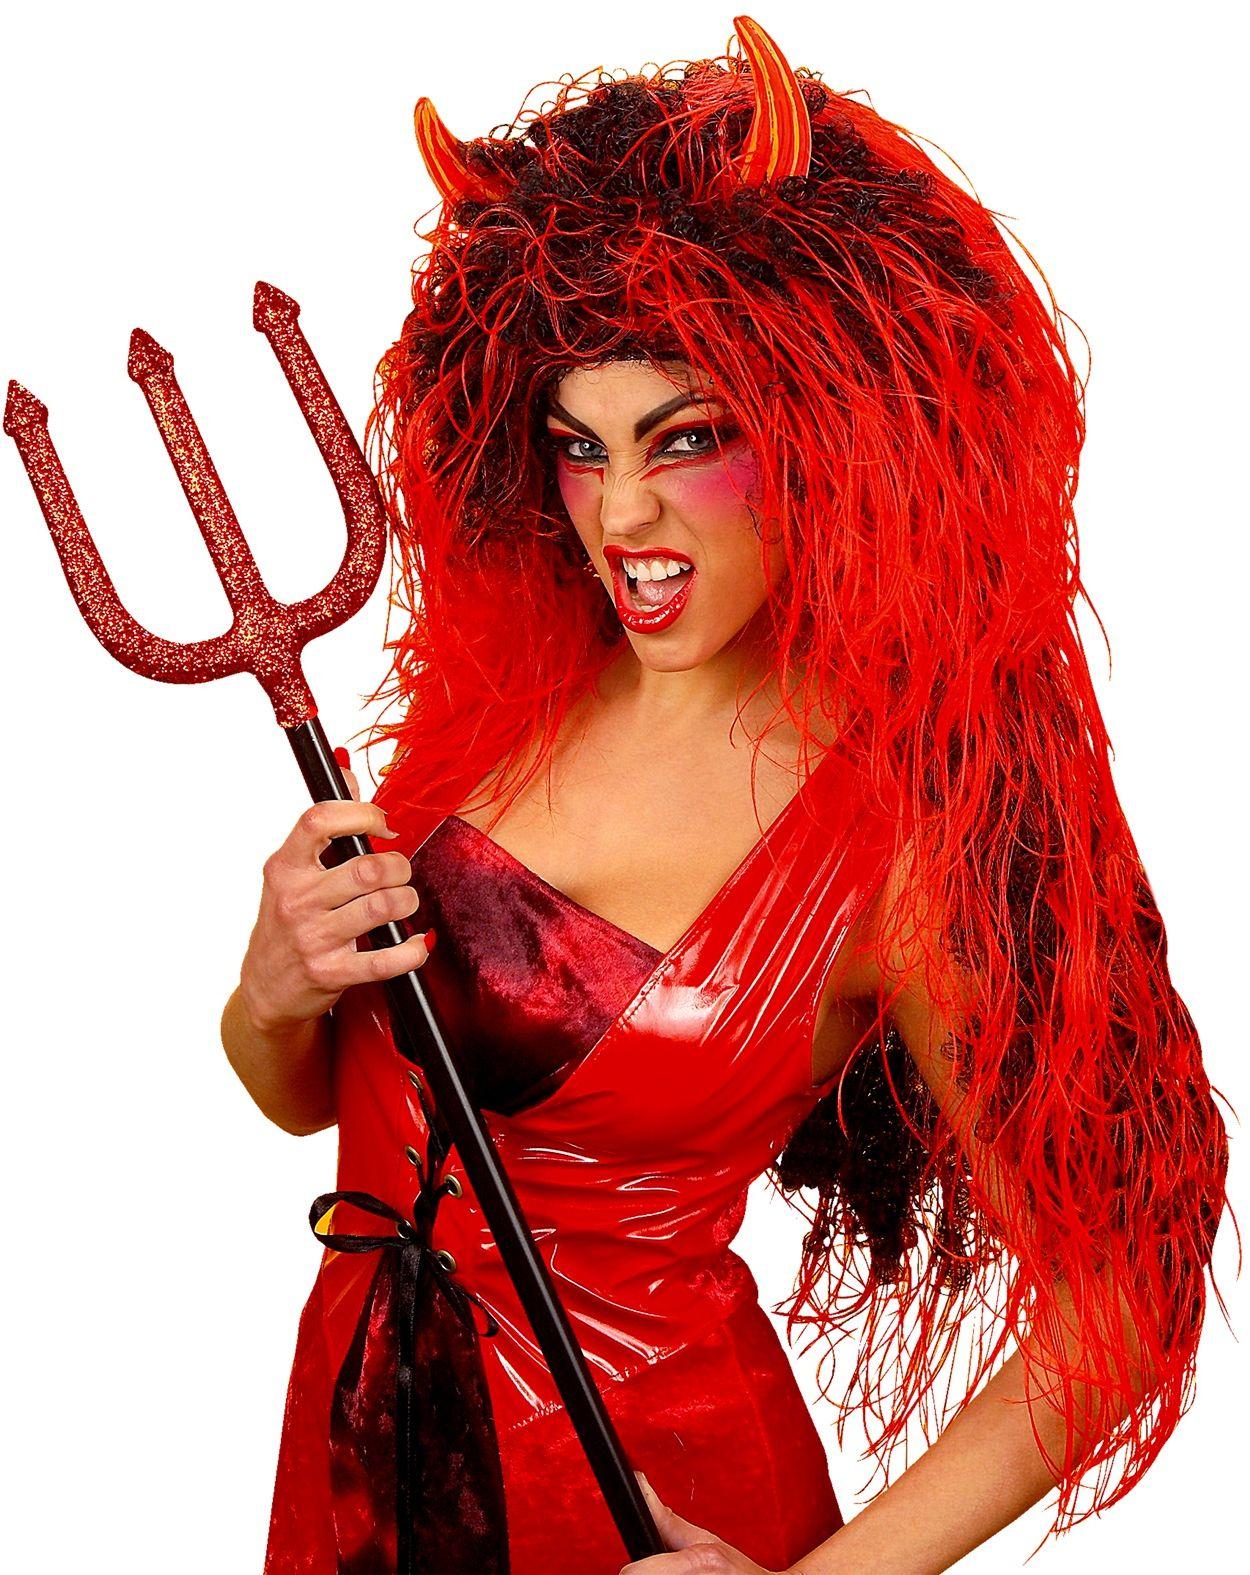 Rode duivel pruik lang haar